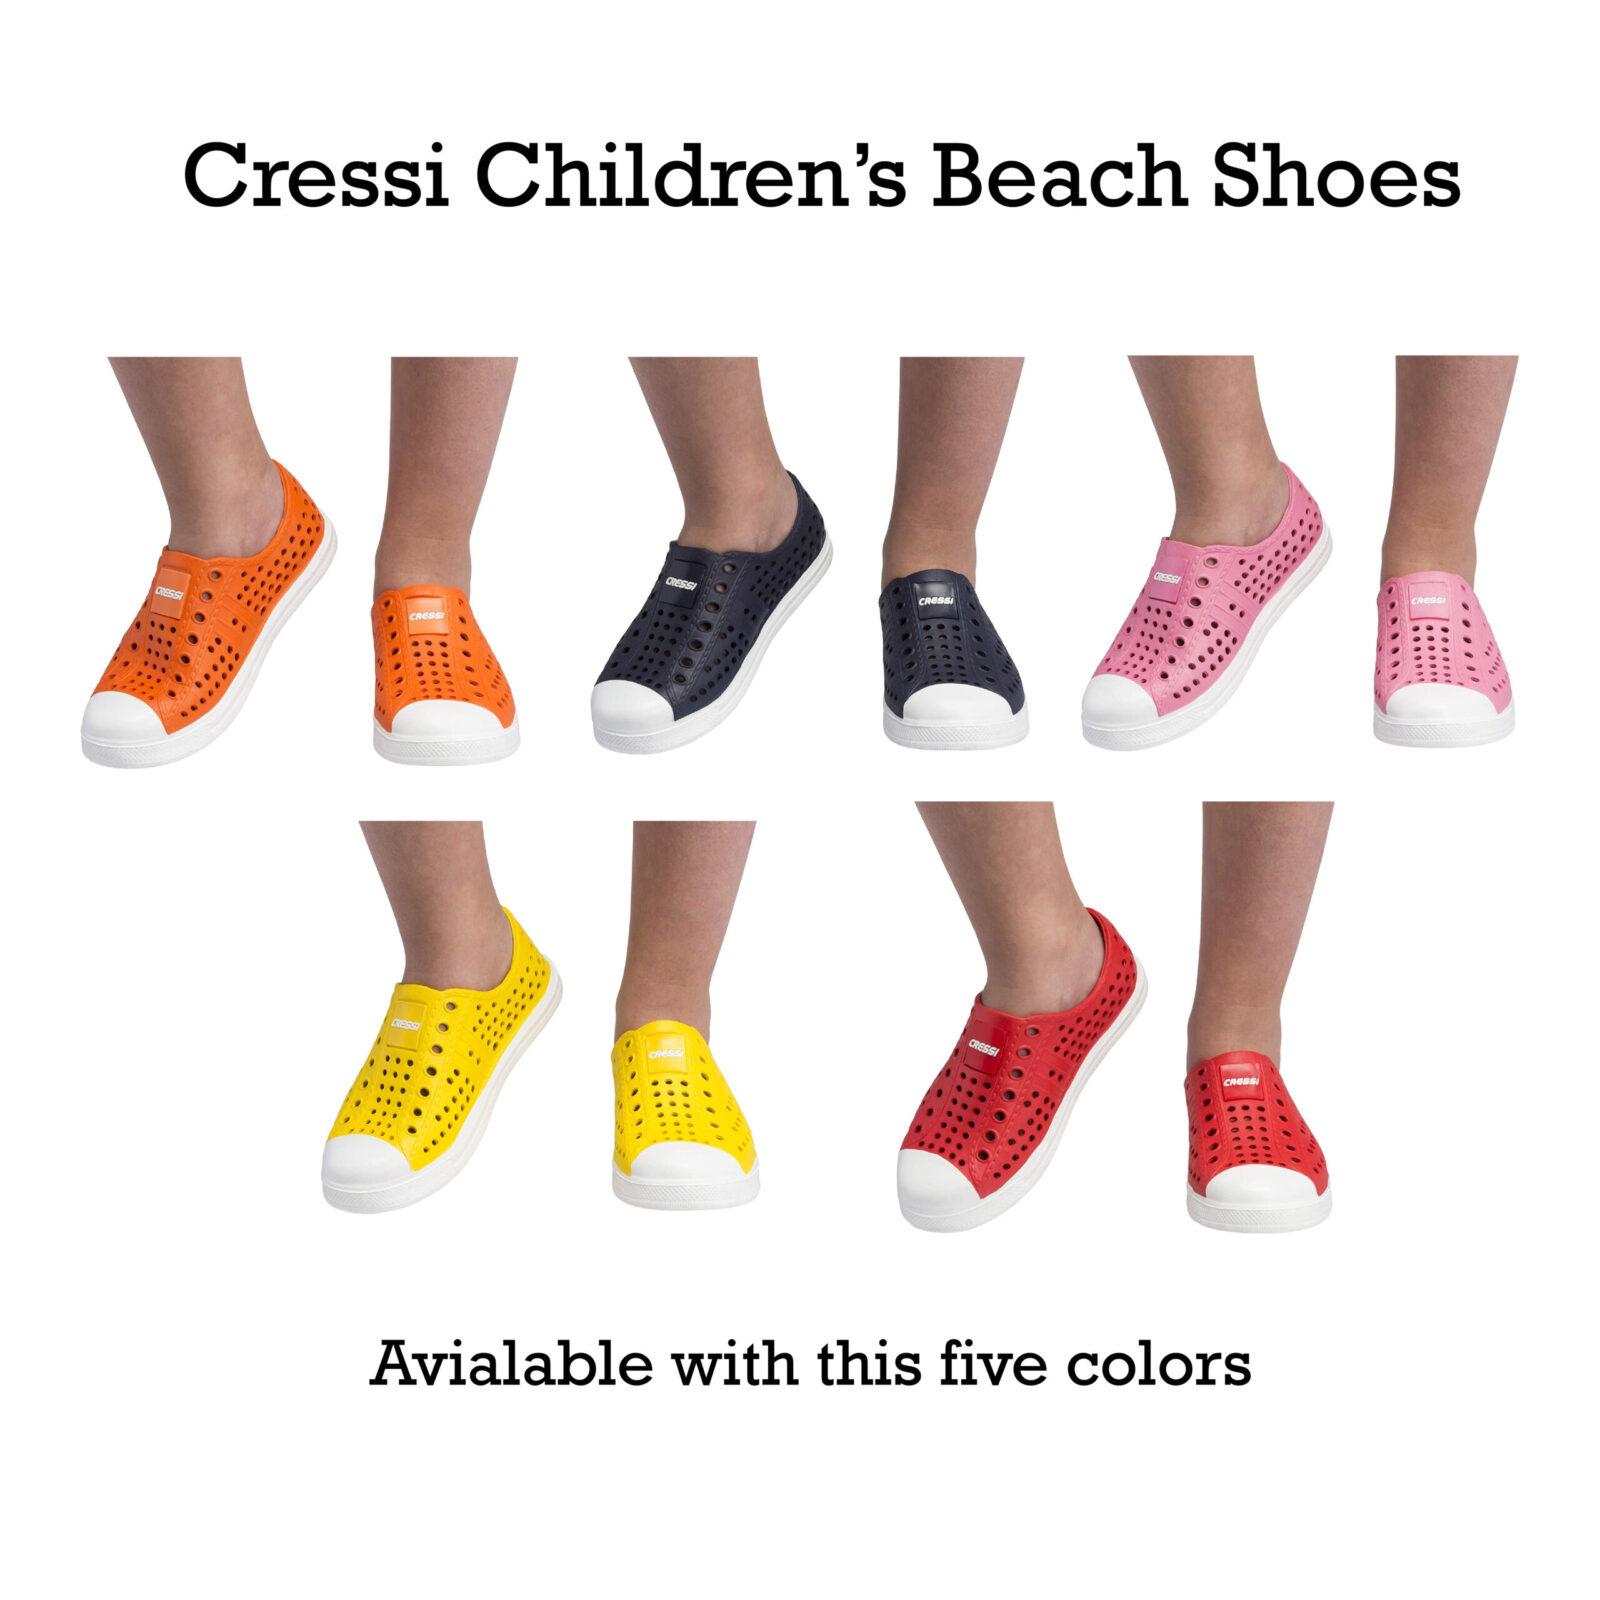 Children's Beach Shoes-01